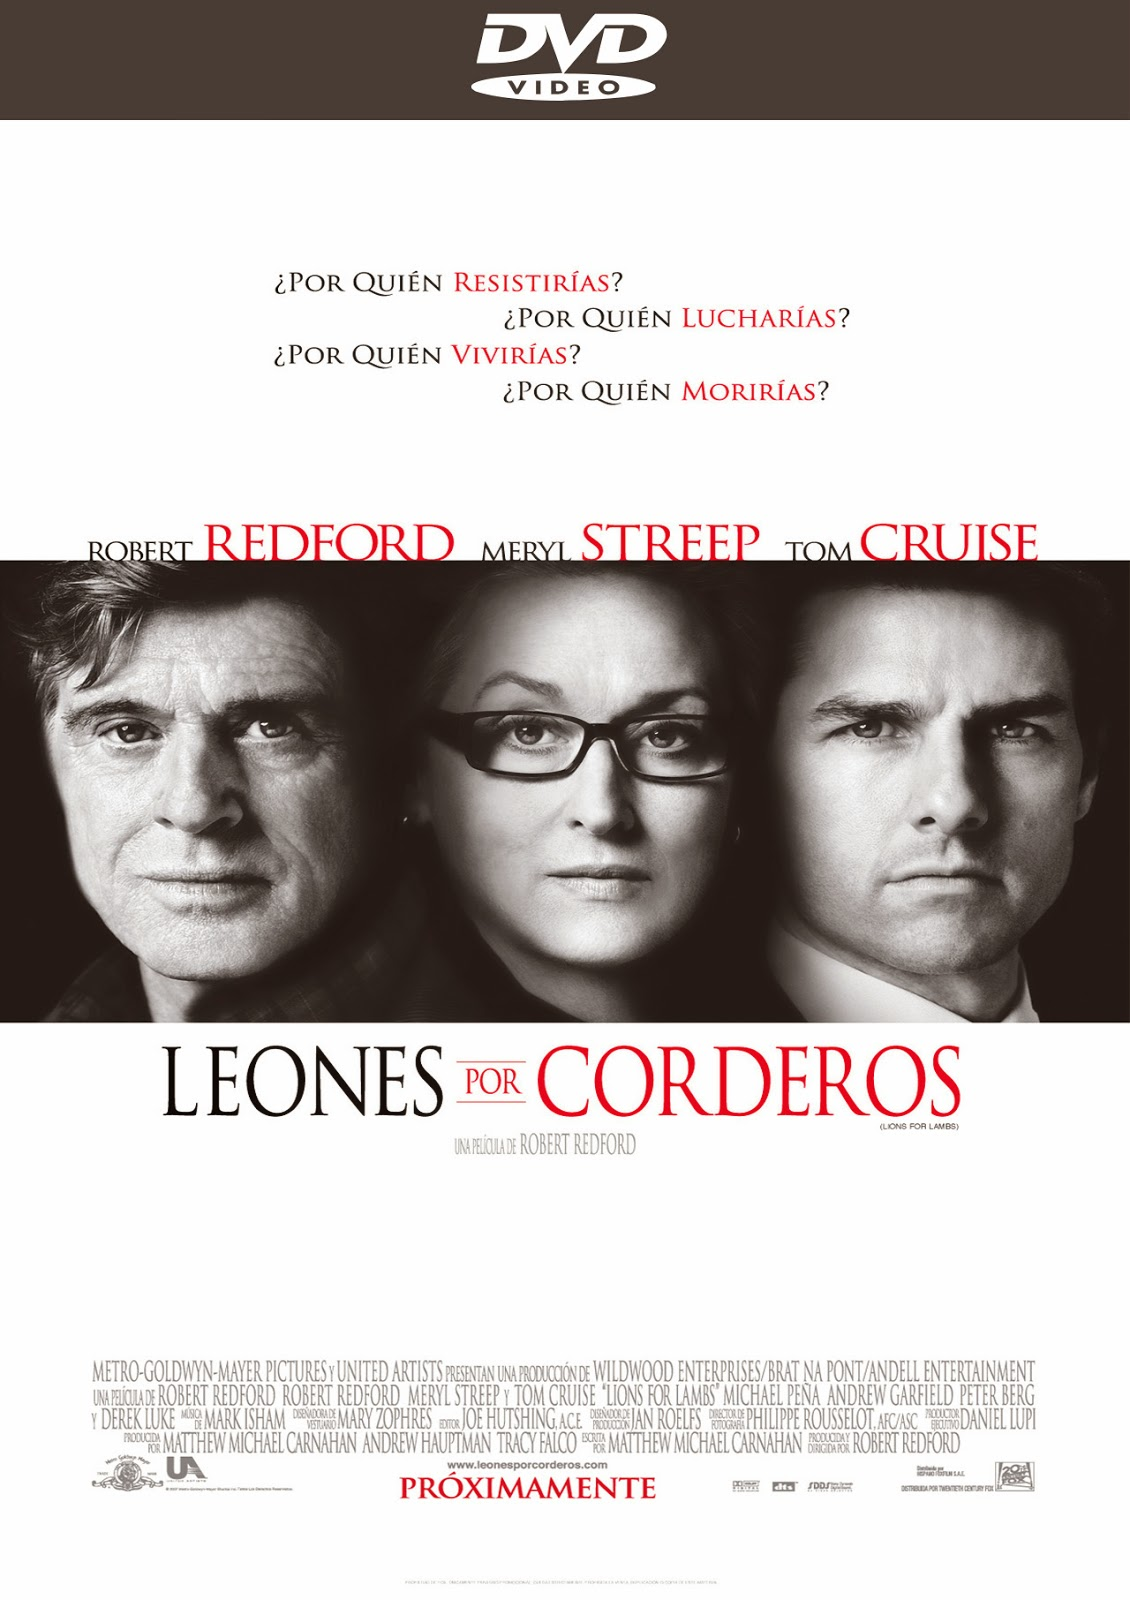 Leones por Corderos [2007] [Latino] [DVD full]